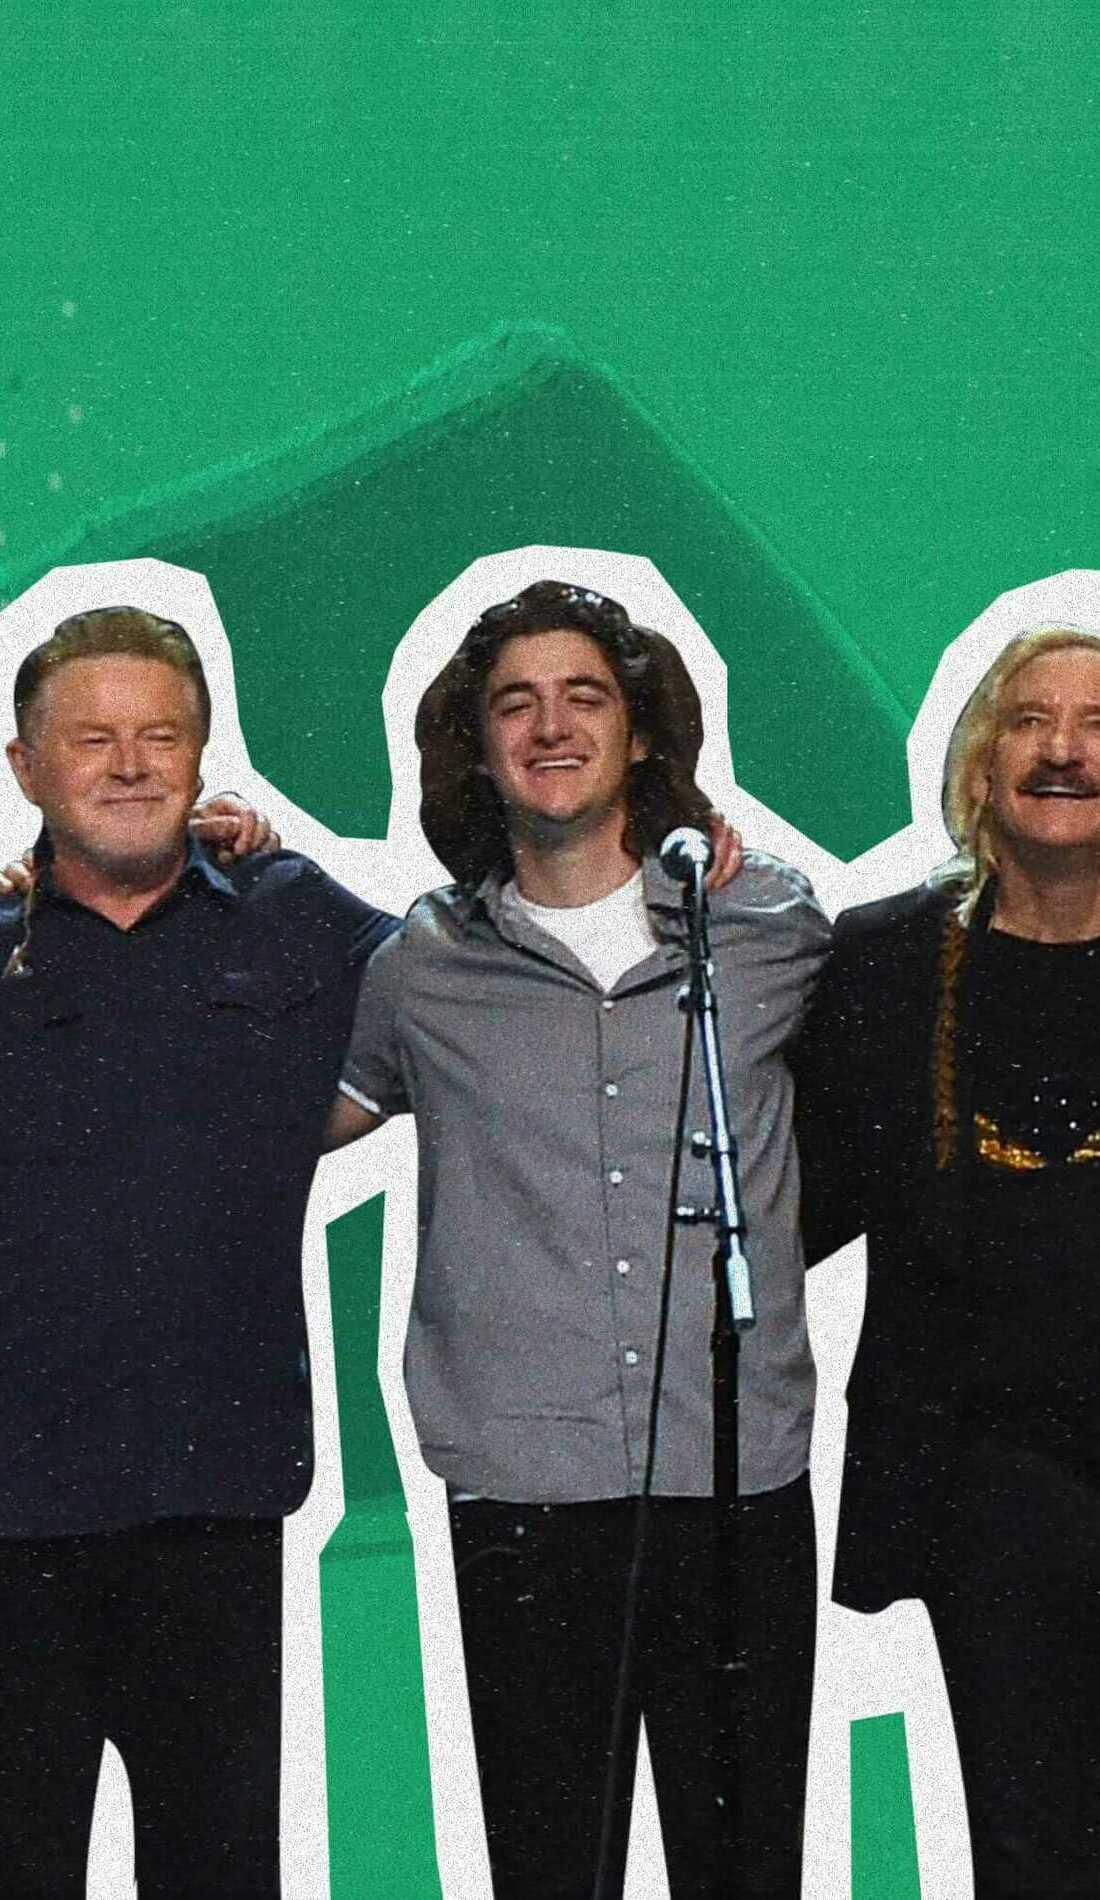 A Eagles live event